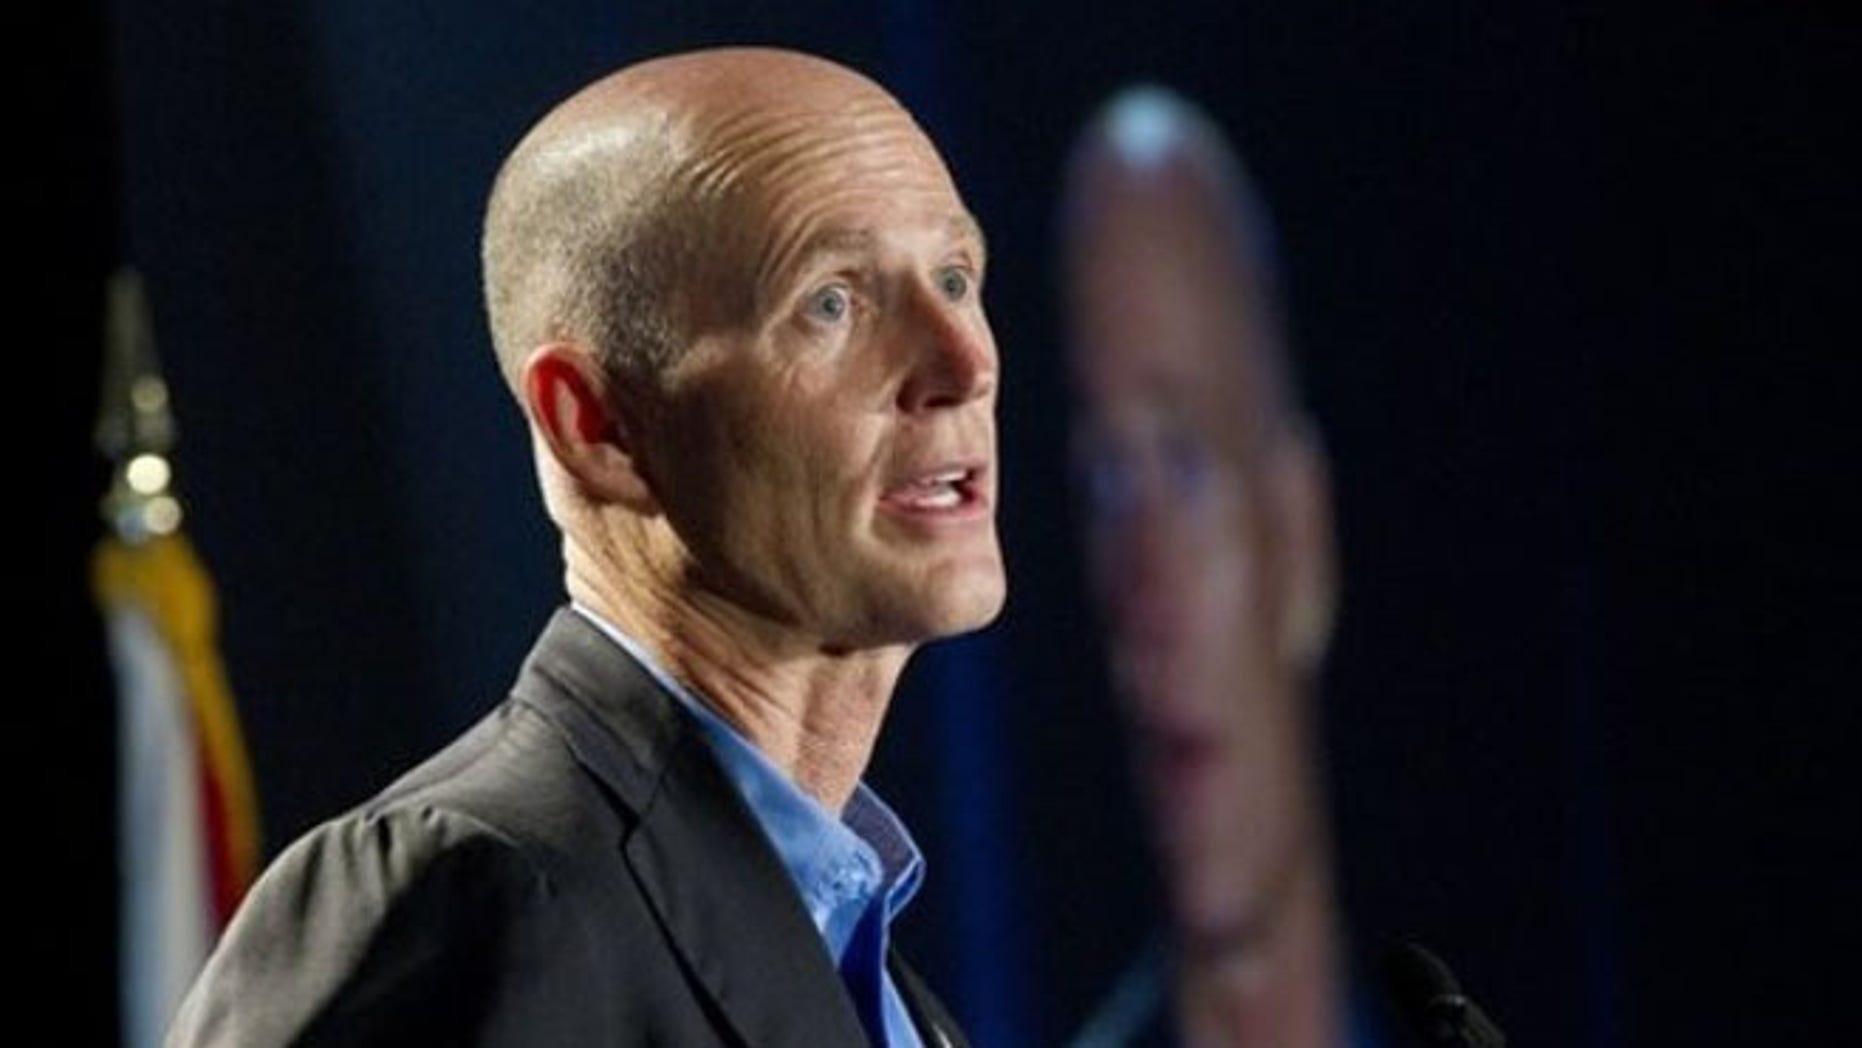 Florida Gov. Rick Scott speaks in Fort Lauderdale, May 16, 2012.